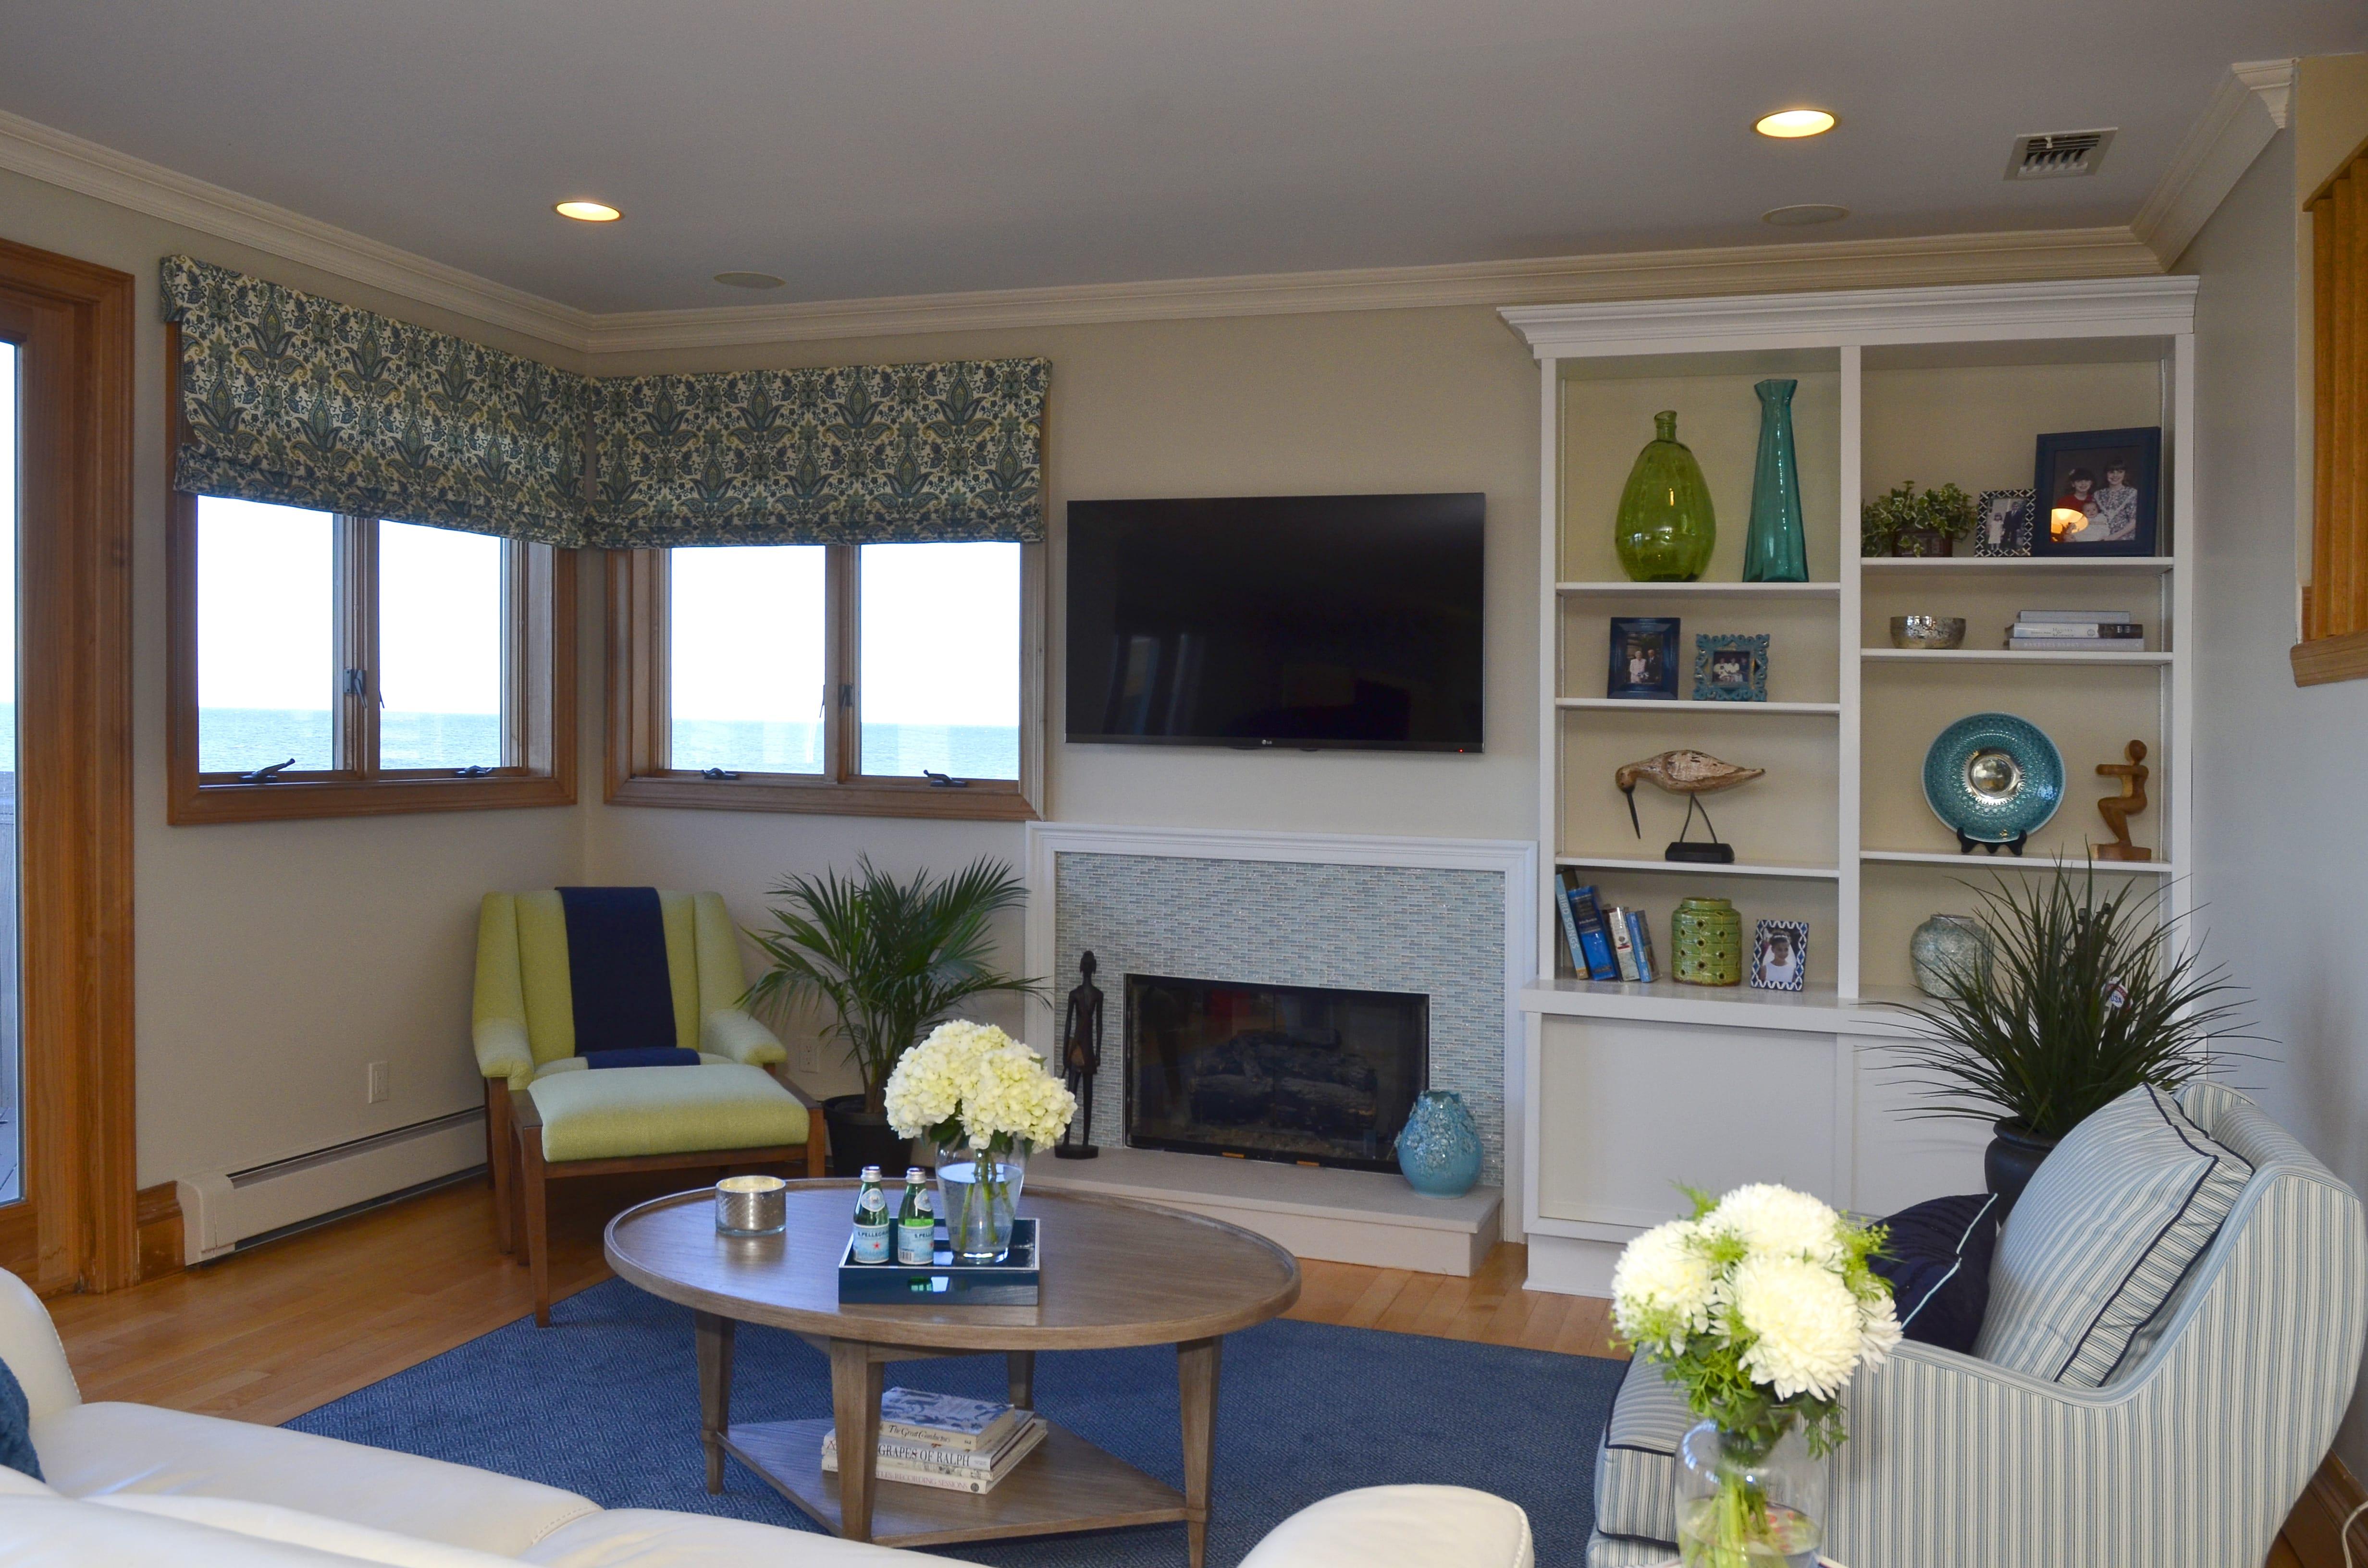 Long Island Interior Designer Gallery and Inspiration